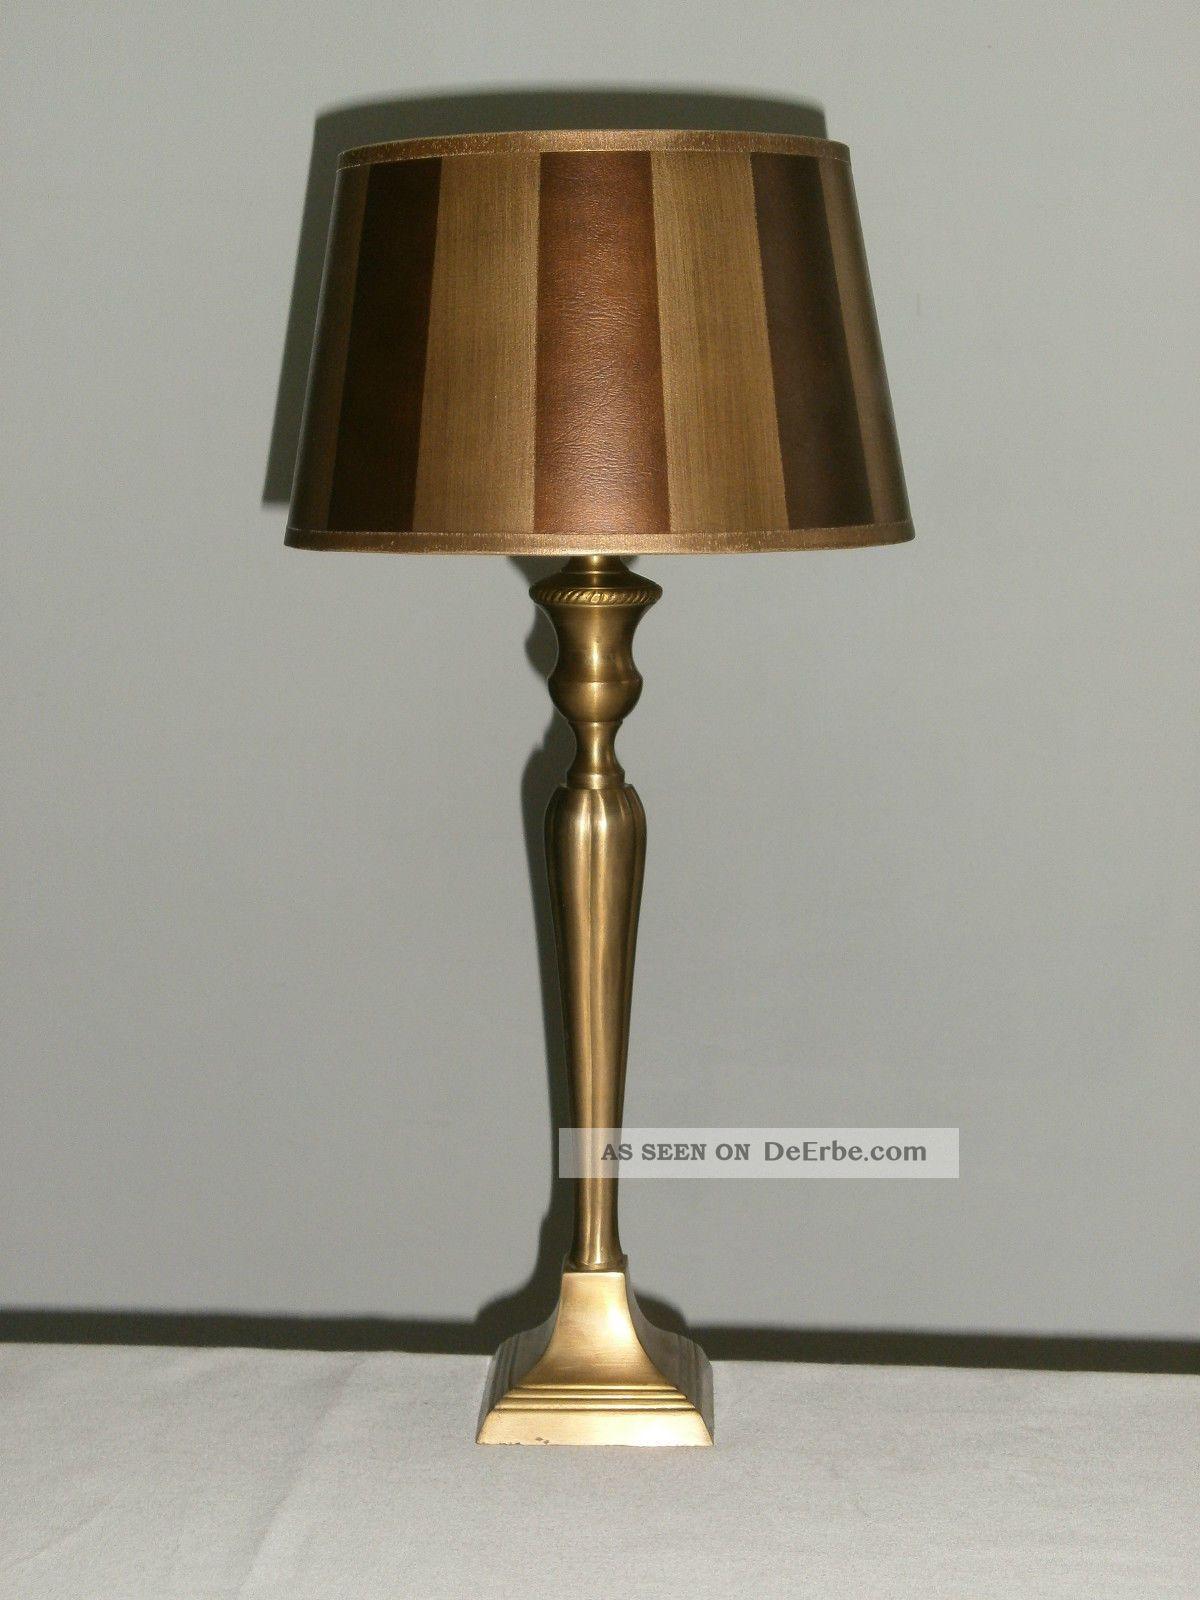 2 ltere noble grosse tischlampen tischleuchten aus messing landhaus. Black Bedroom Furniture Sets. Home Design Ideas